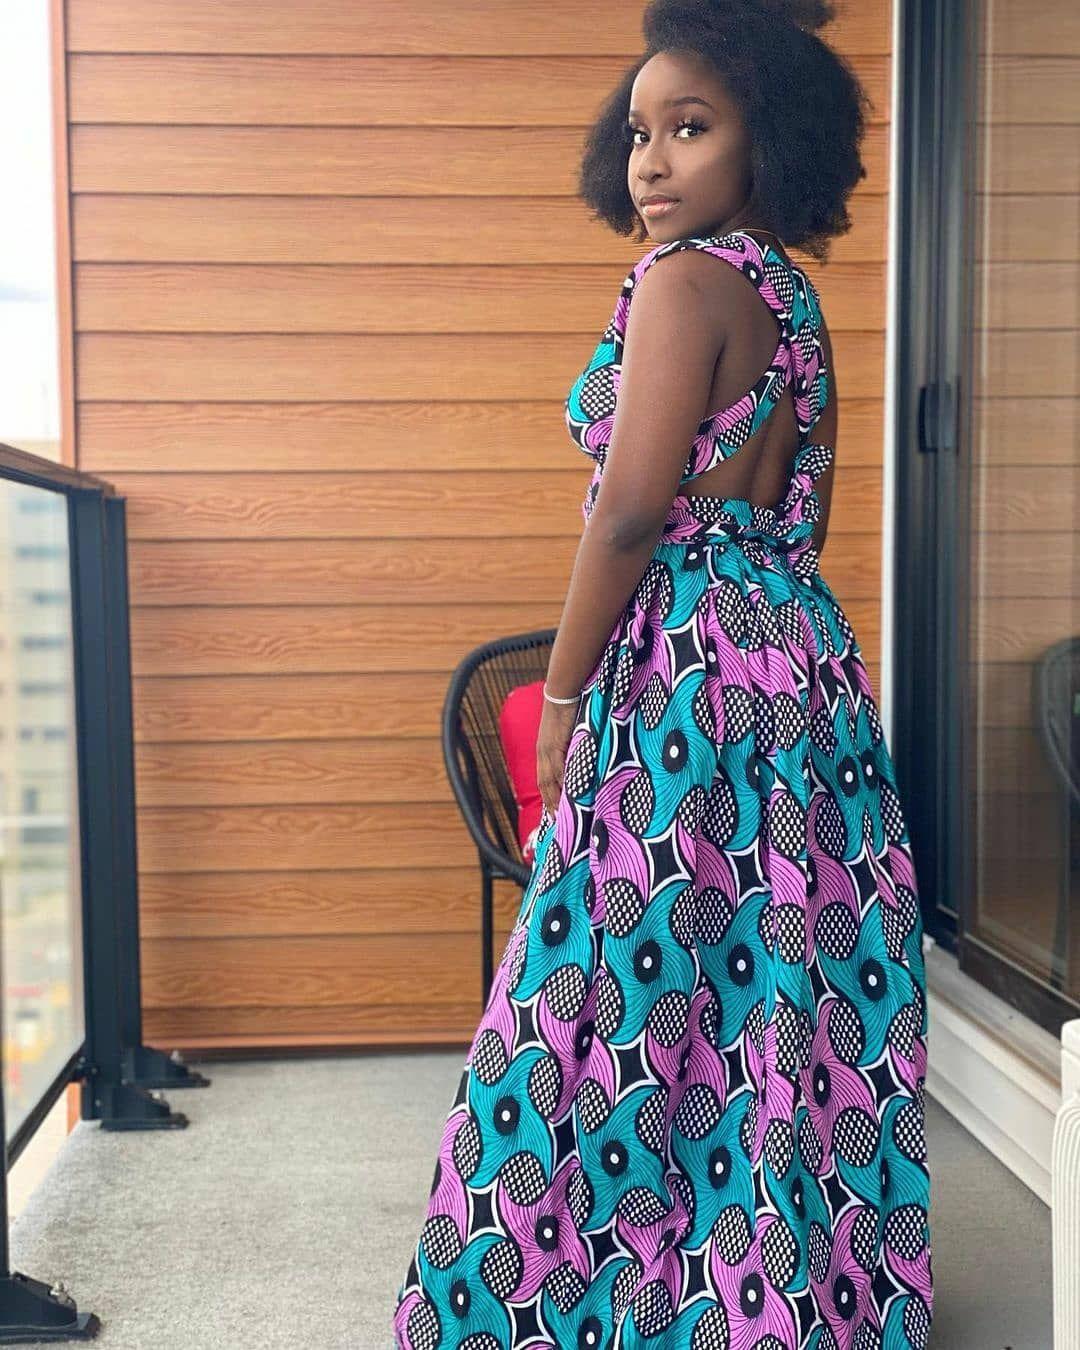 stylish ankara dresses 2019,styles for 2020 latest ankara styles 2019 for ladies,latest ankara long gown styles 2020 nigeria ankara style,latest ankara short gown styles 2020